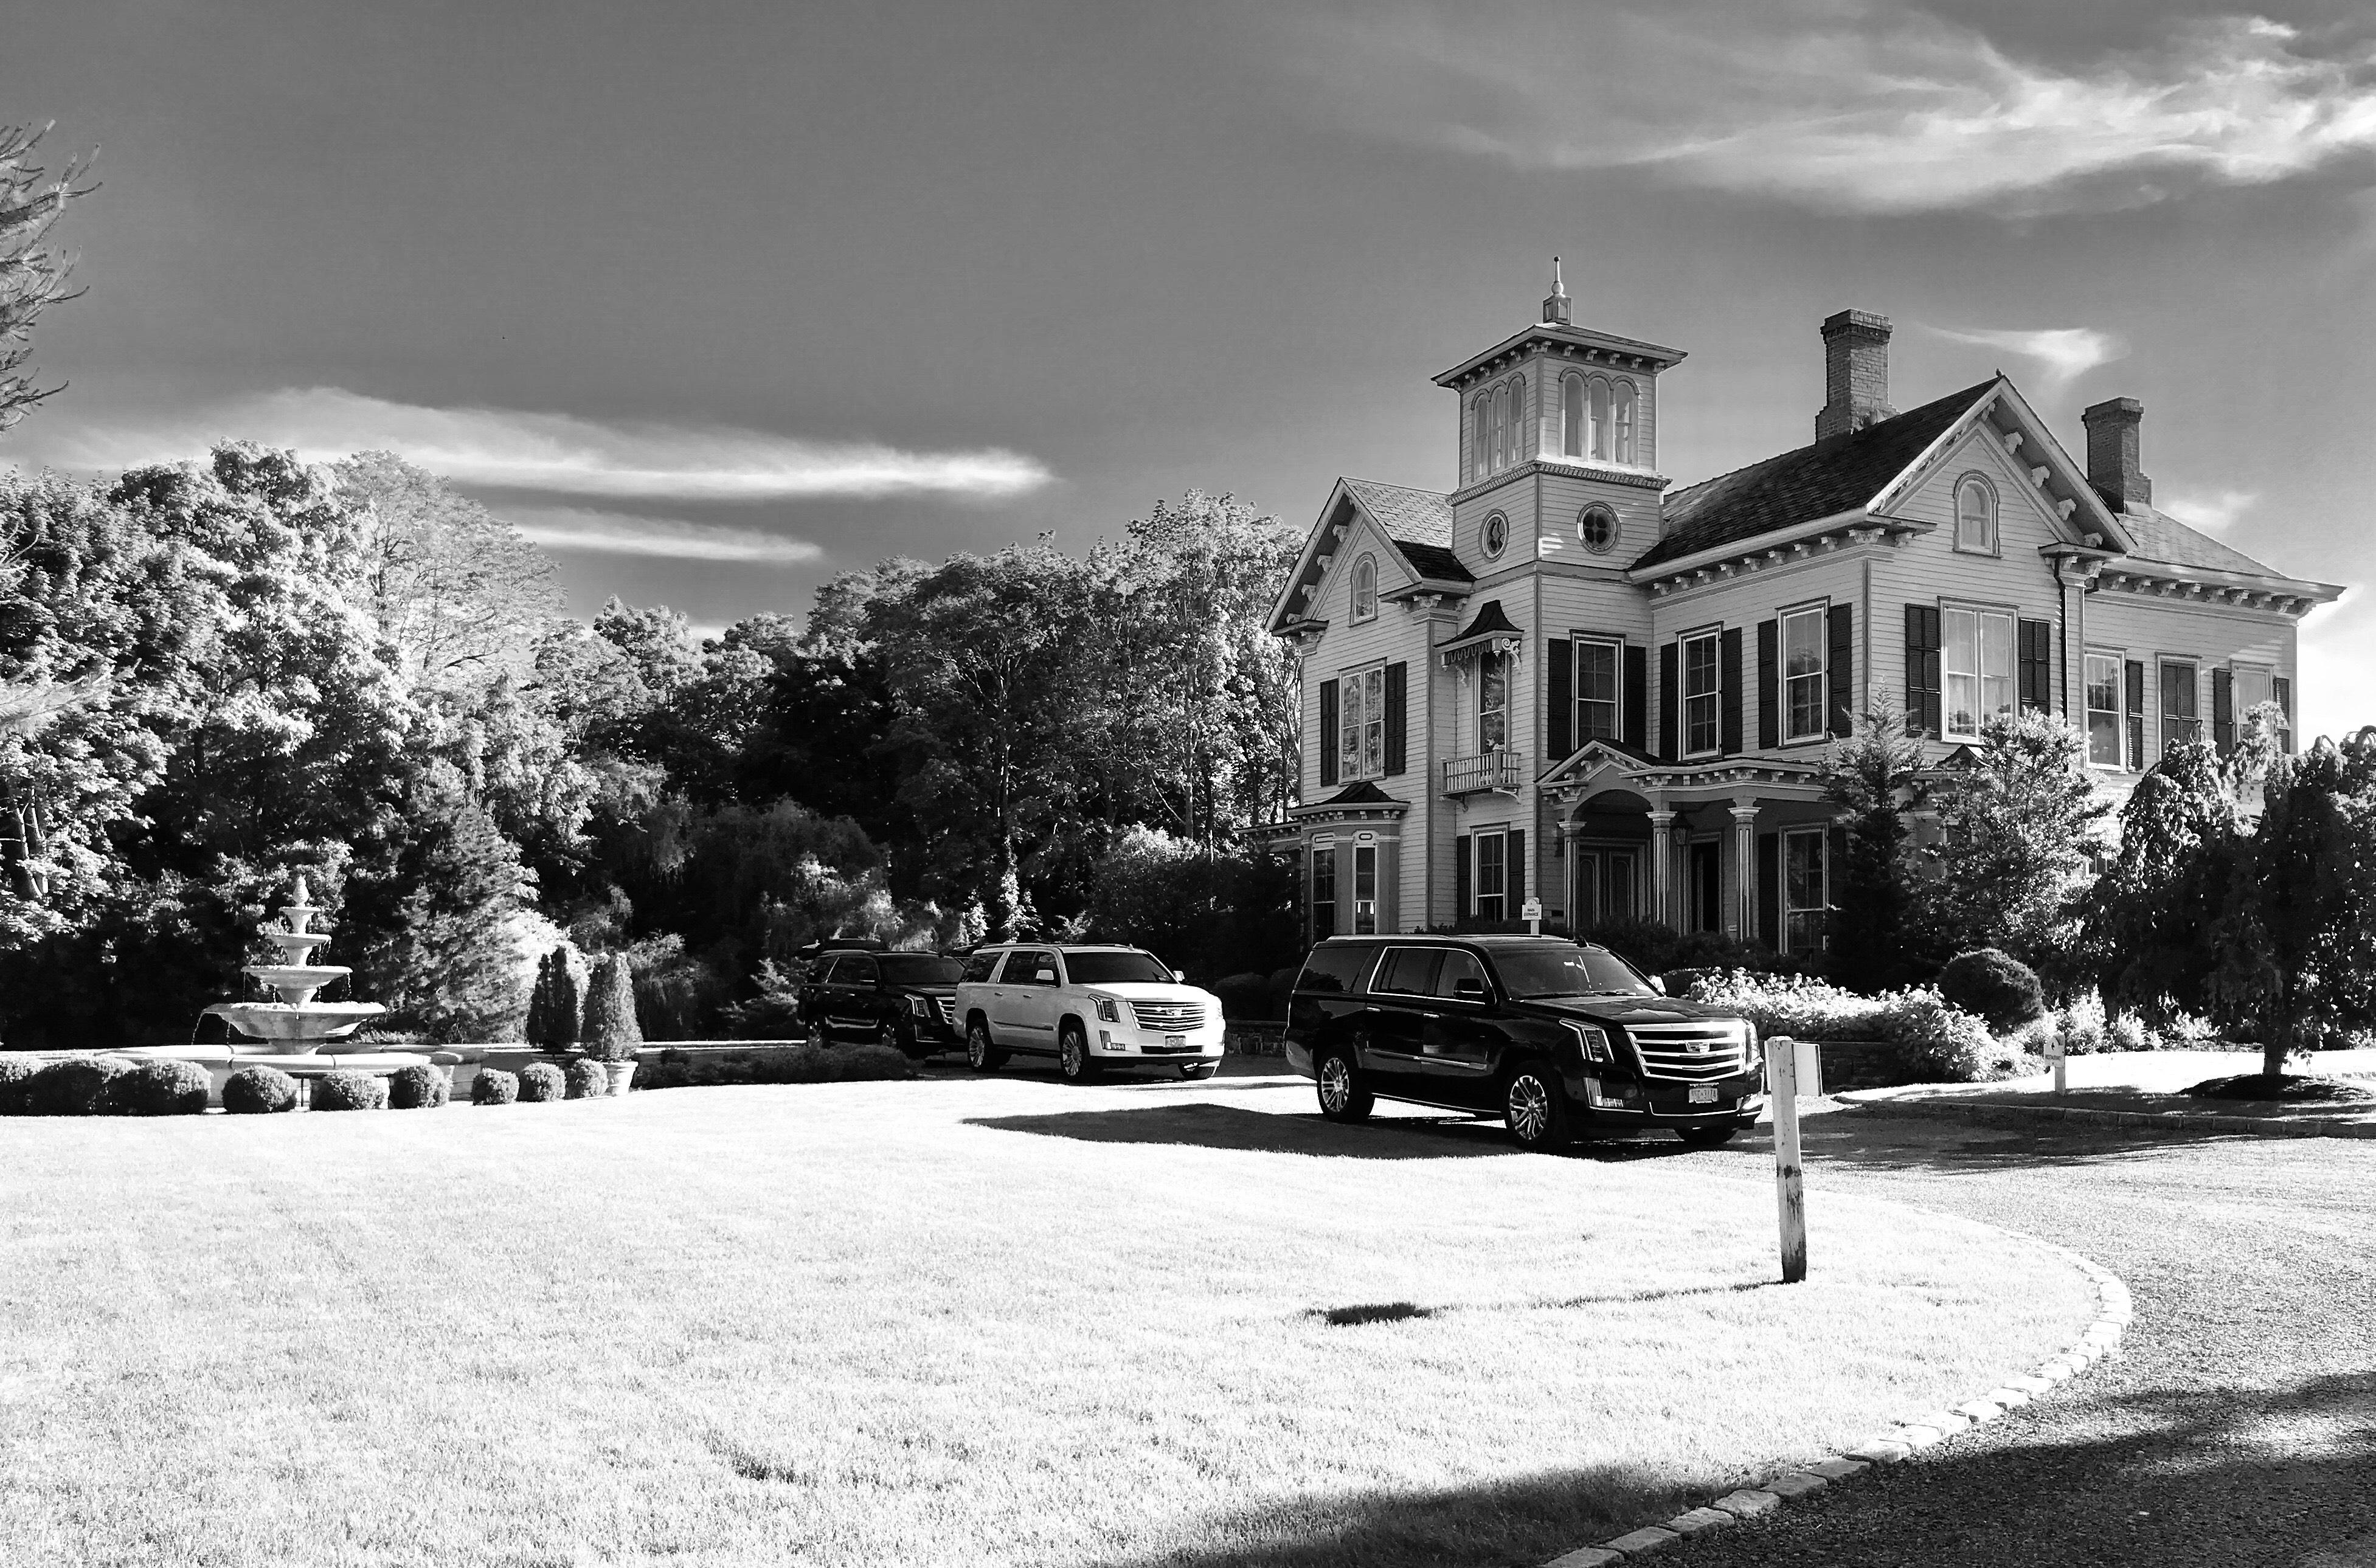 Hamptons Bluebird Limo image